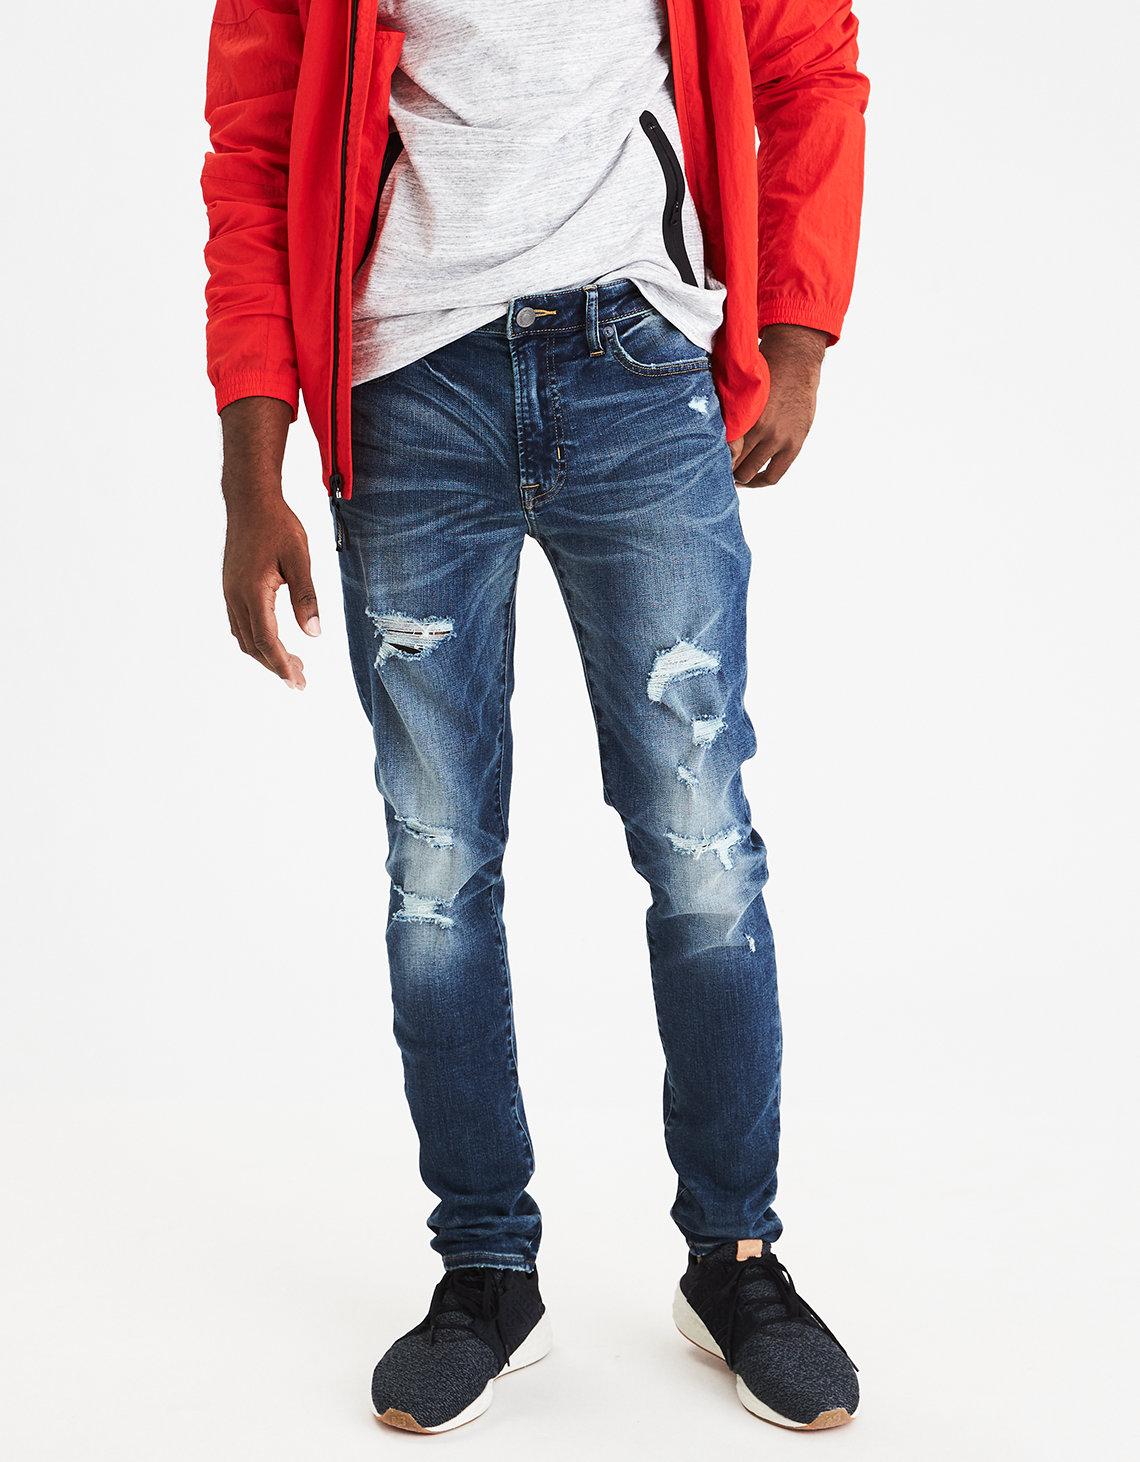 AEO Extreme Flex Super Skinny Jean, Medium Destroy | American Eagle  Outfitters - AEO Extreme Flex Super Skinny Jean, Medium Destroy American